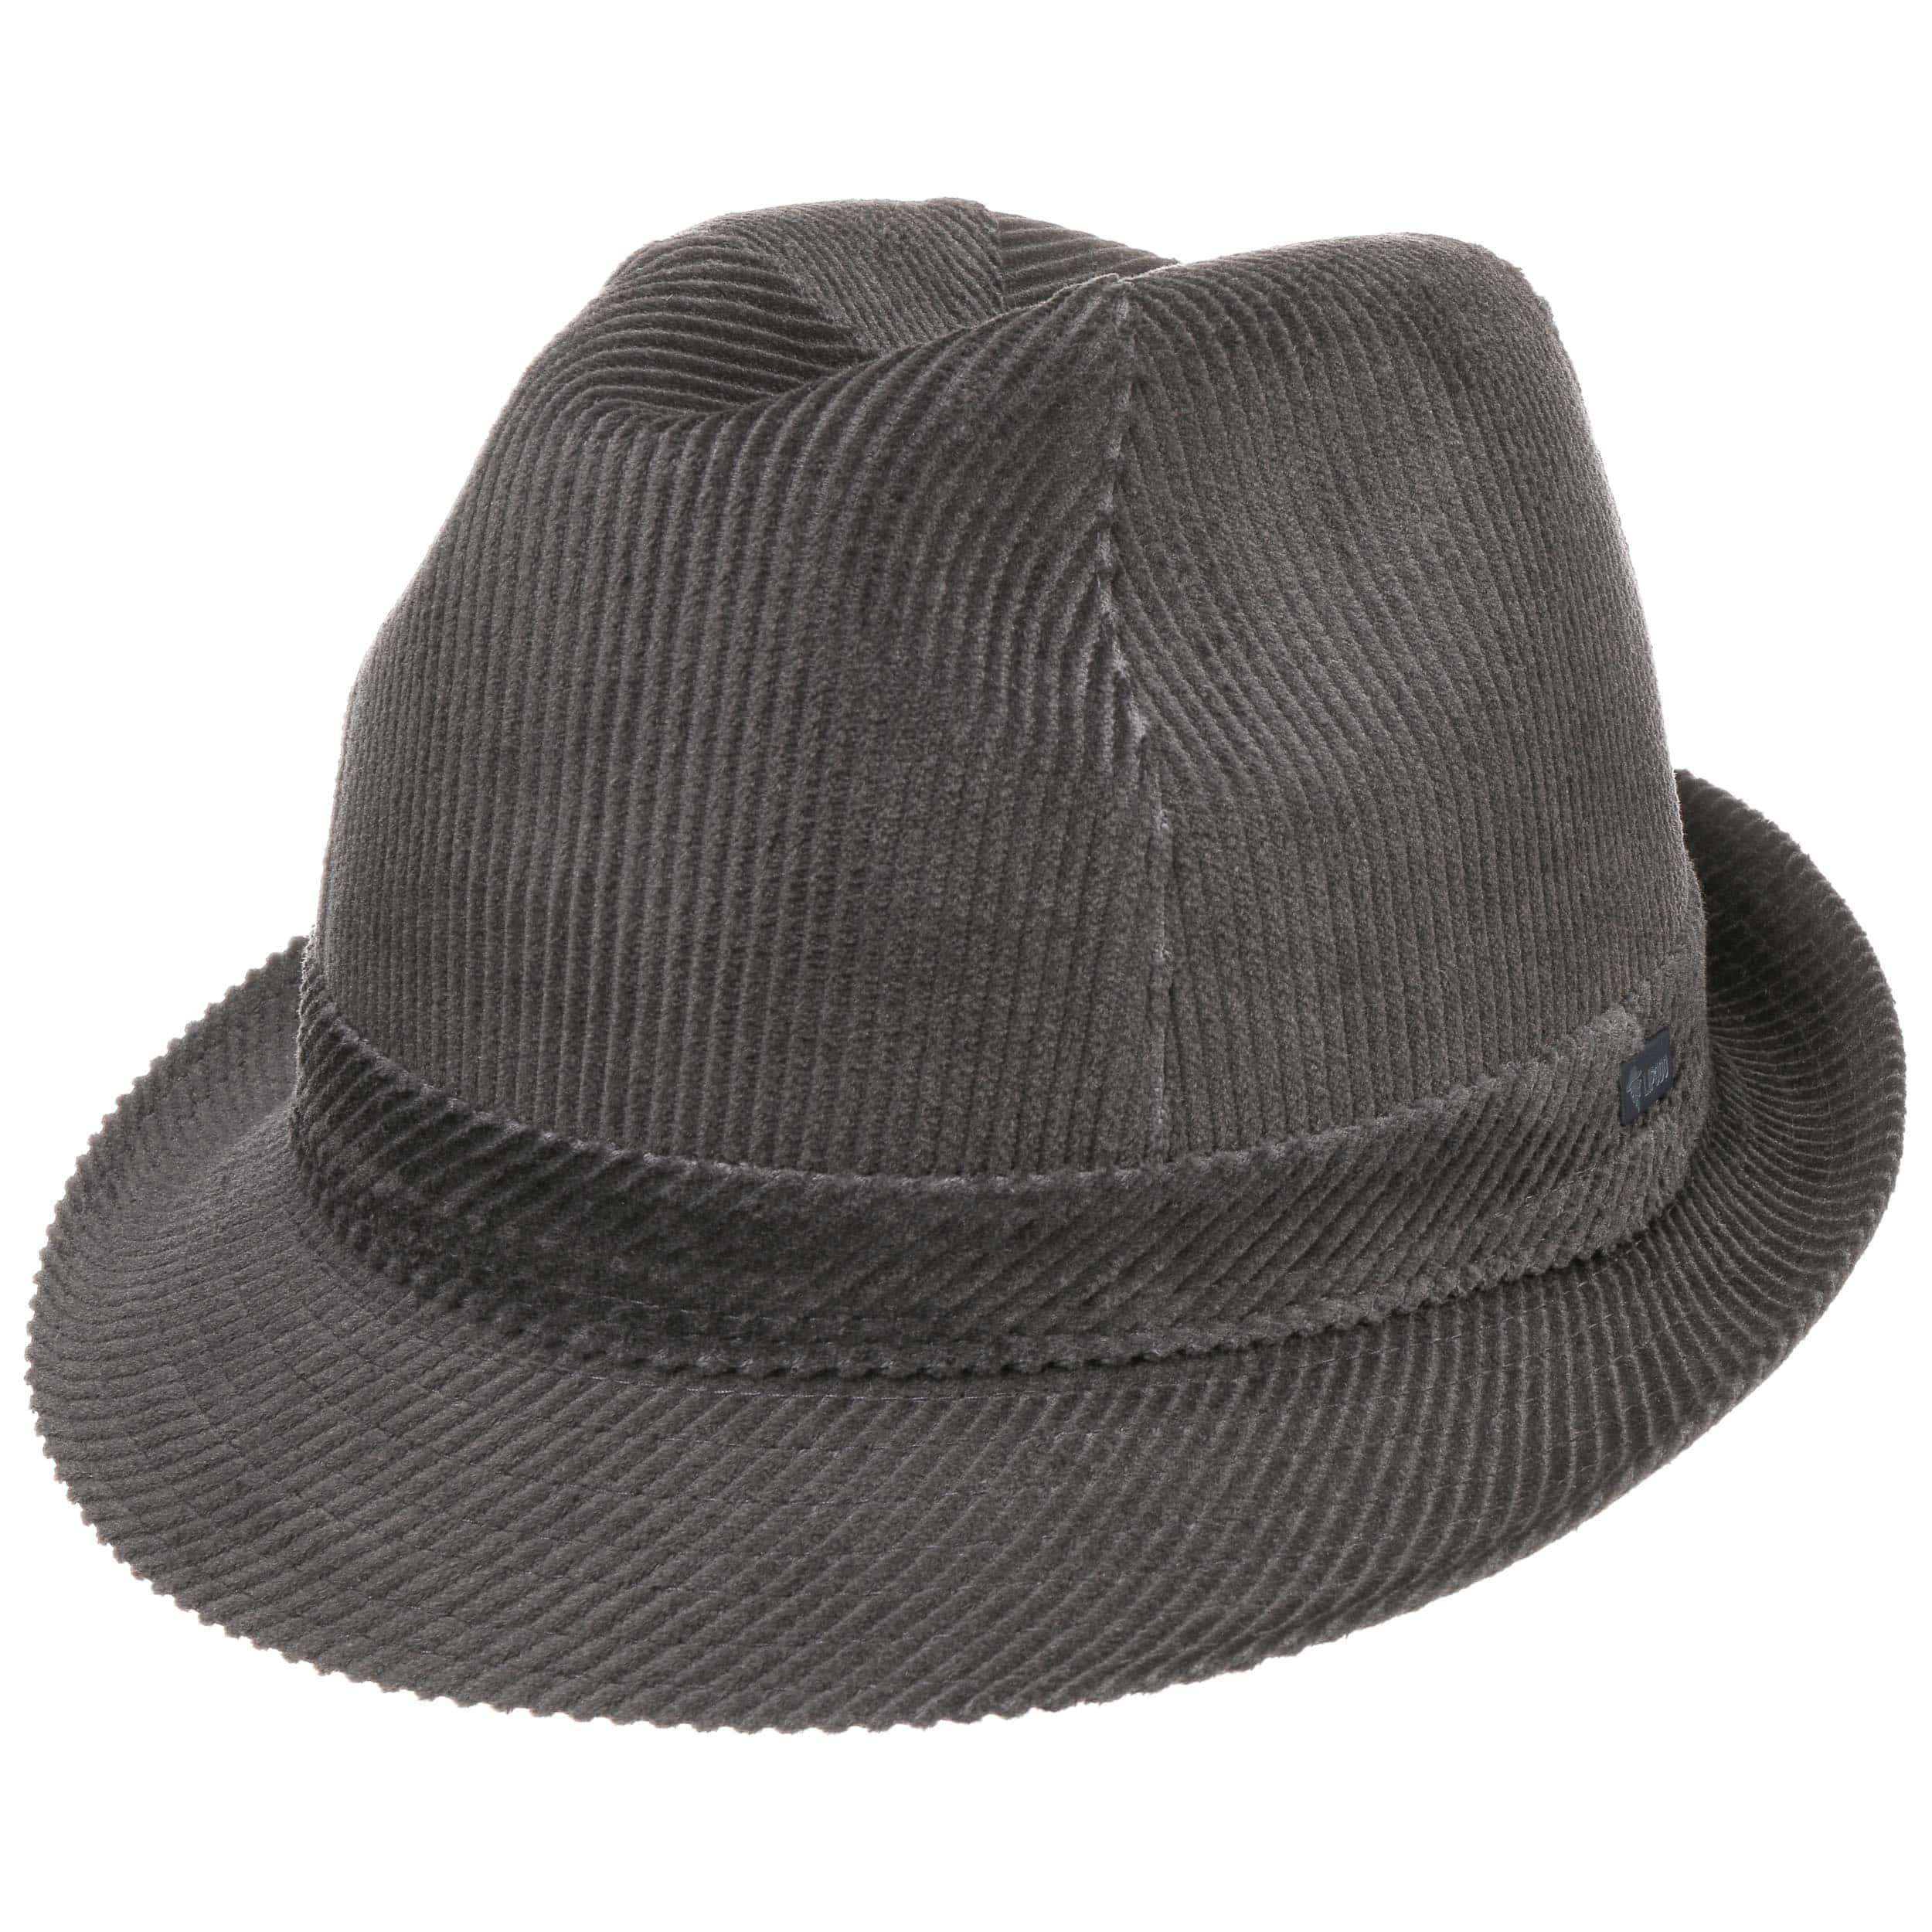 b394ba00bd3 ... Molinar Corduroy Hat by Lipodo - olive 5 ...